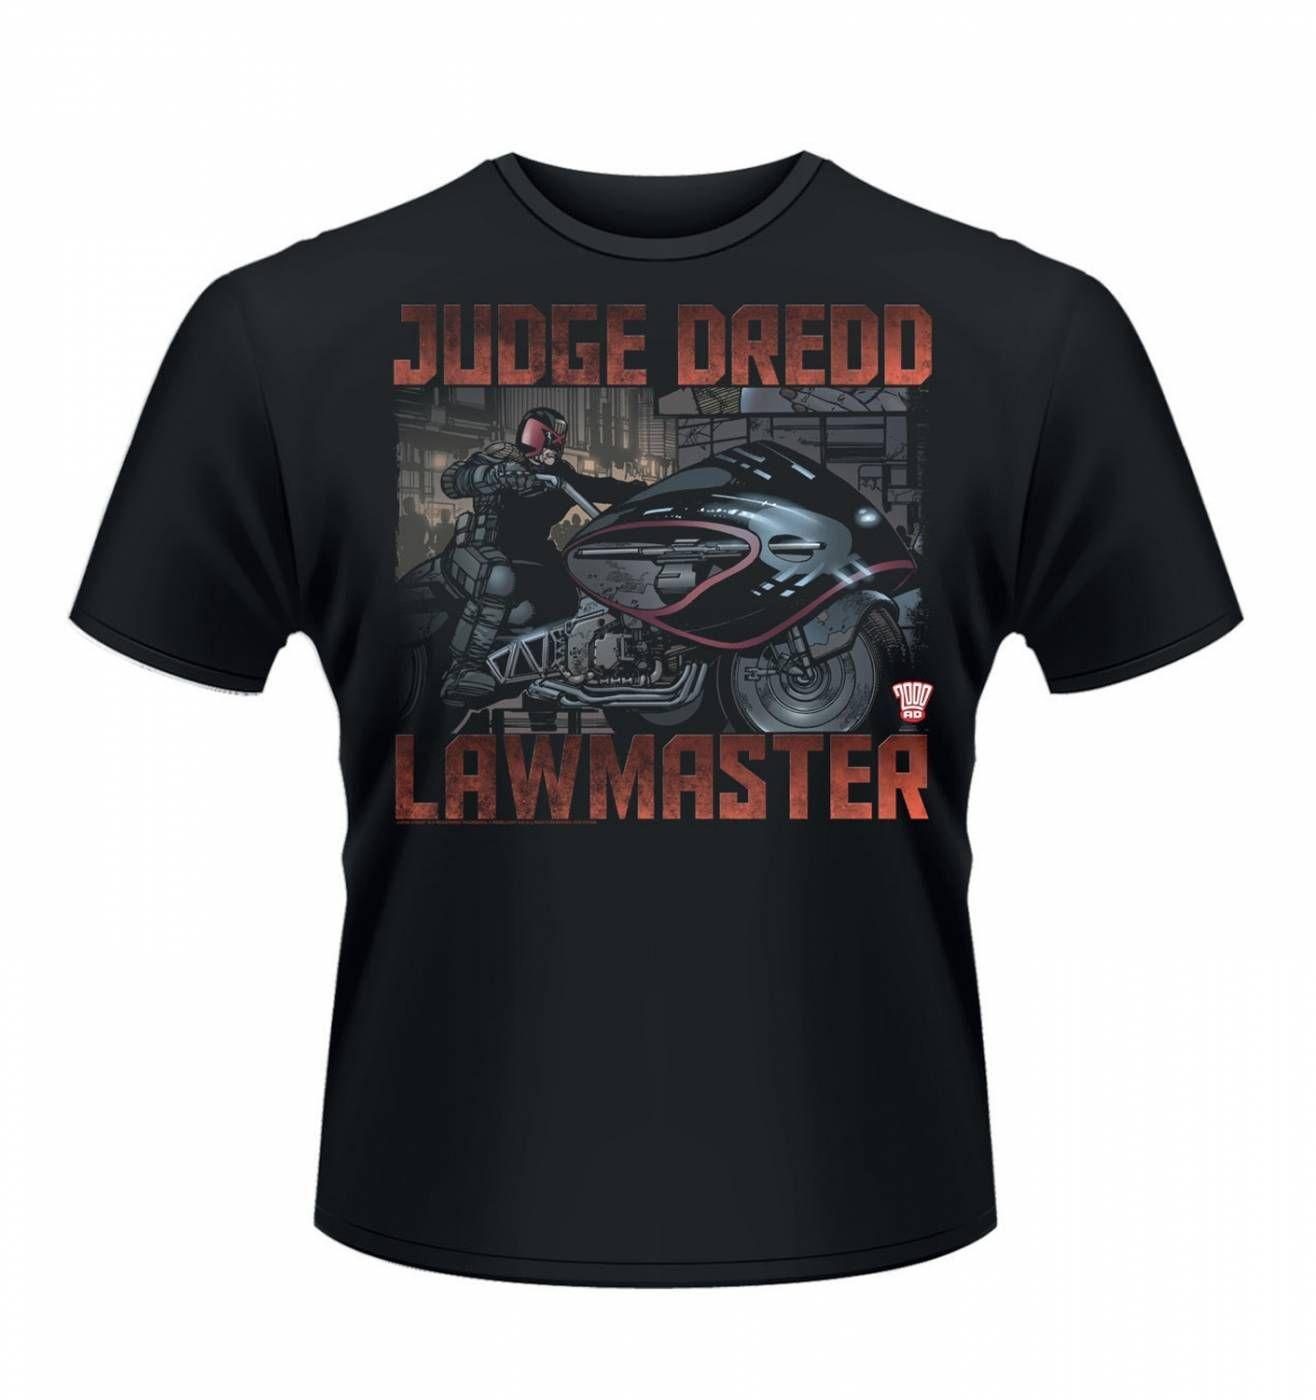 OFFICIAL Judge Dredd Lawmaster men's t-shirt